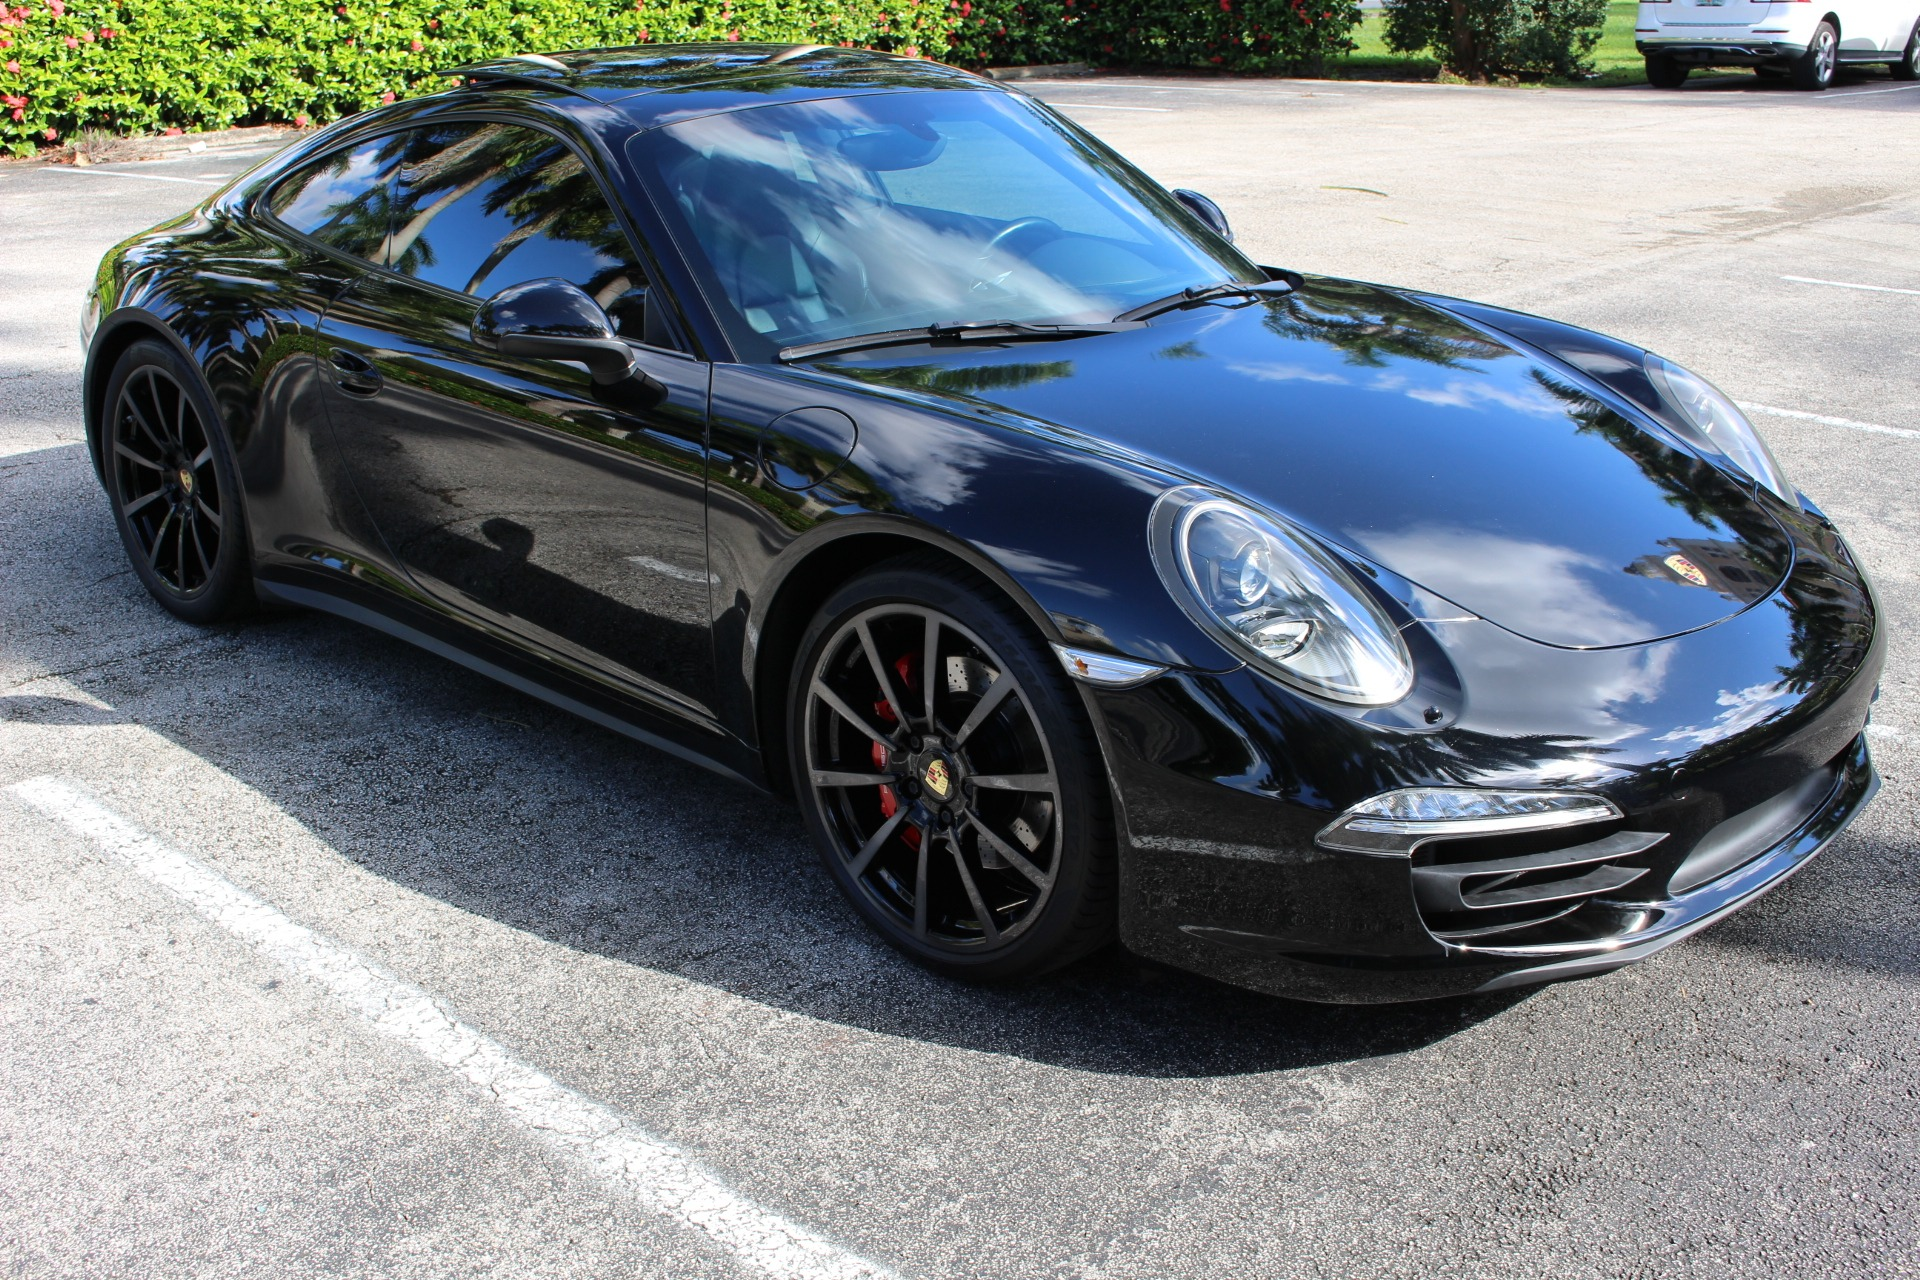 Used 2013 Porsche 911 Carrera 4S for sale $84,850 at The Gables Sports Cars in Miami FL 33146 3